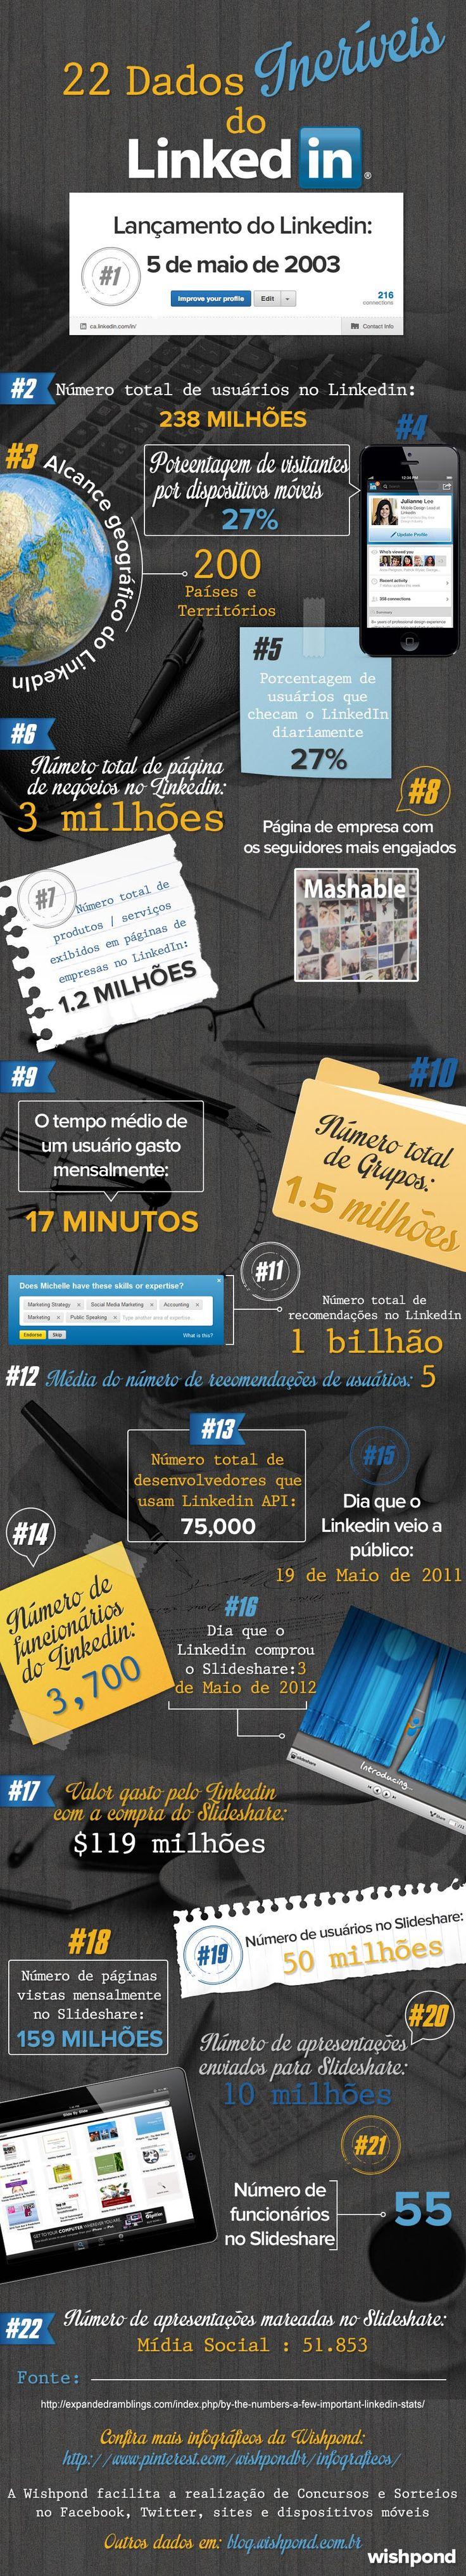 22 dados incríveis sobre o LinkedIn